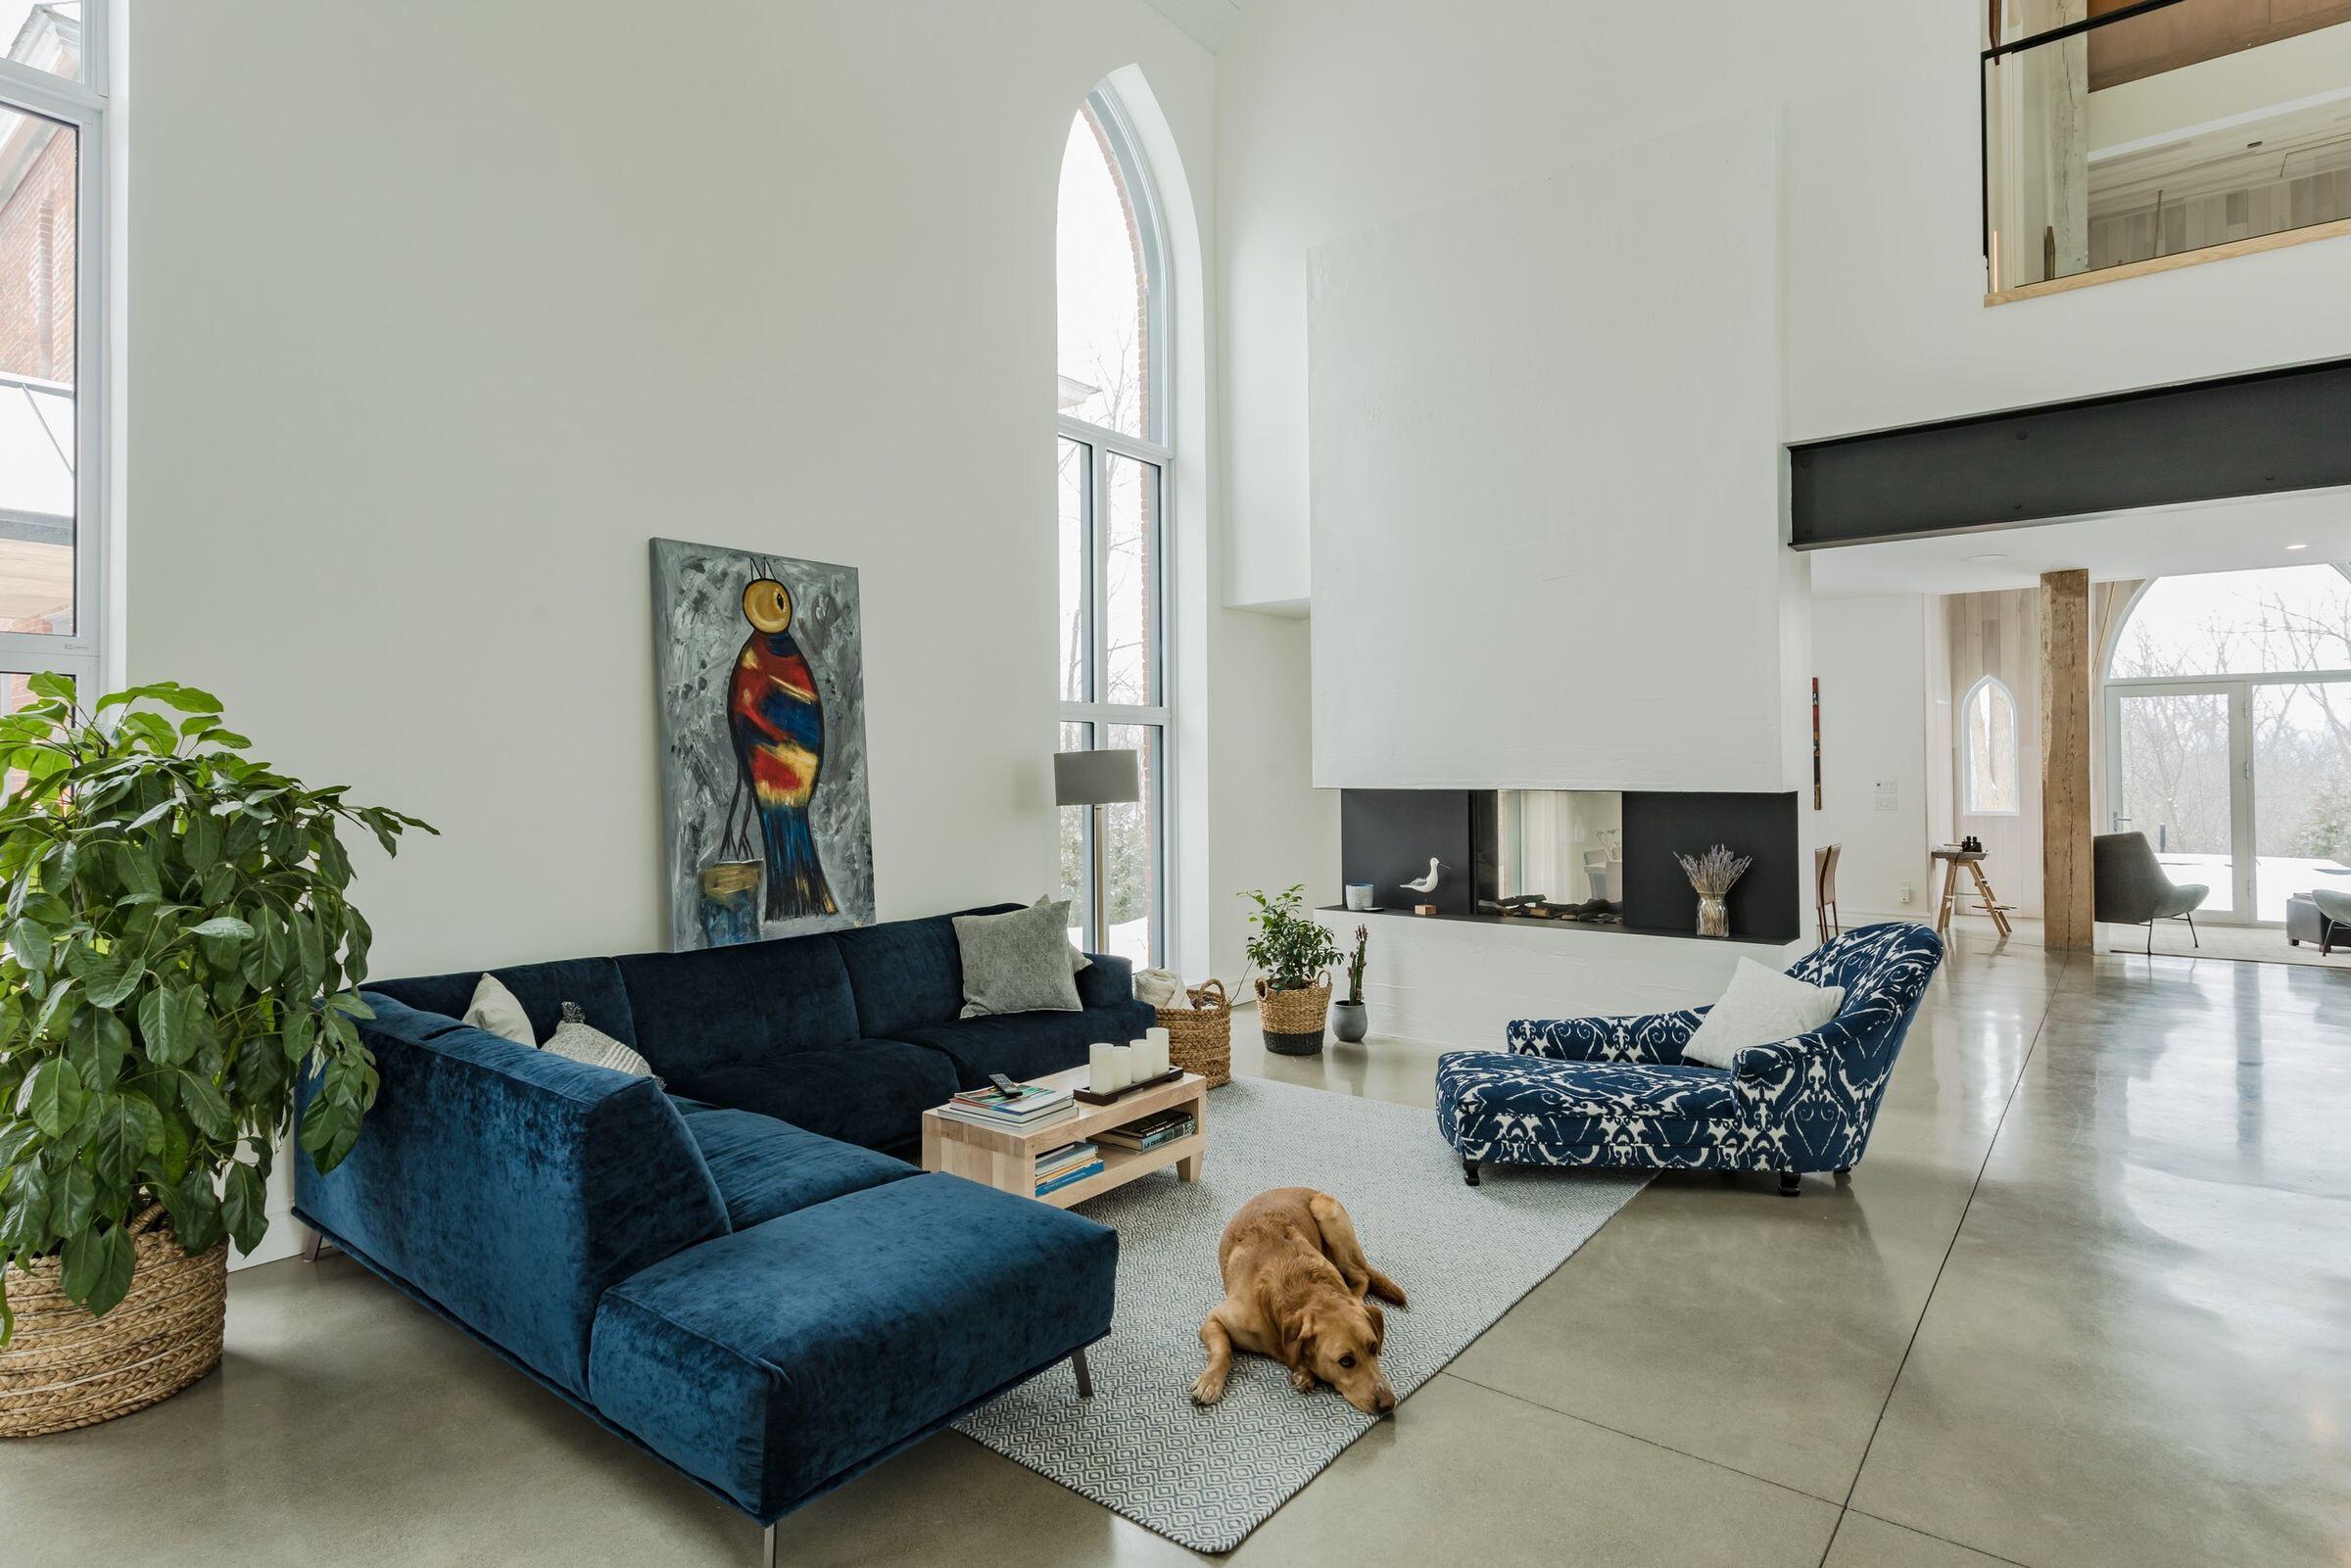 Church's residence